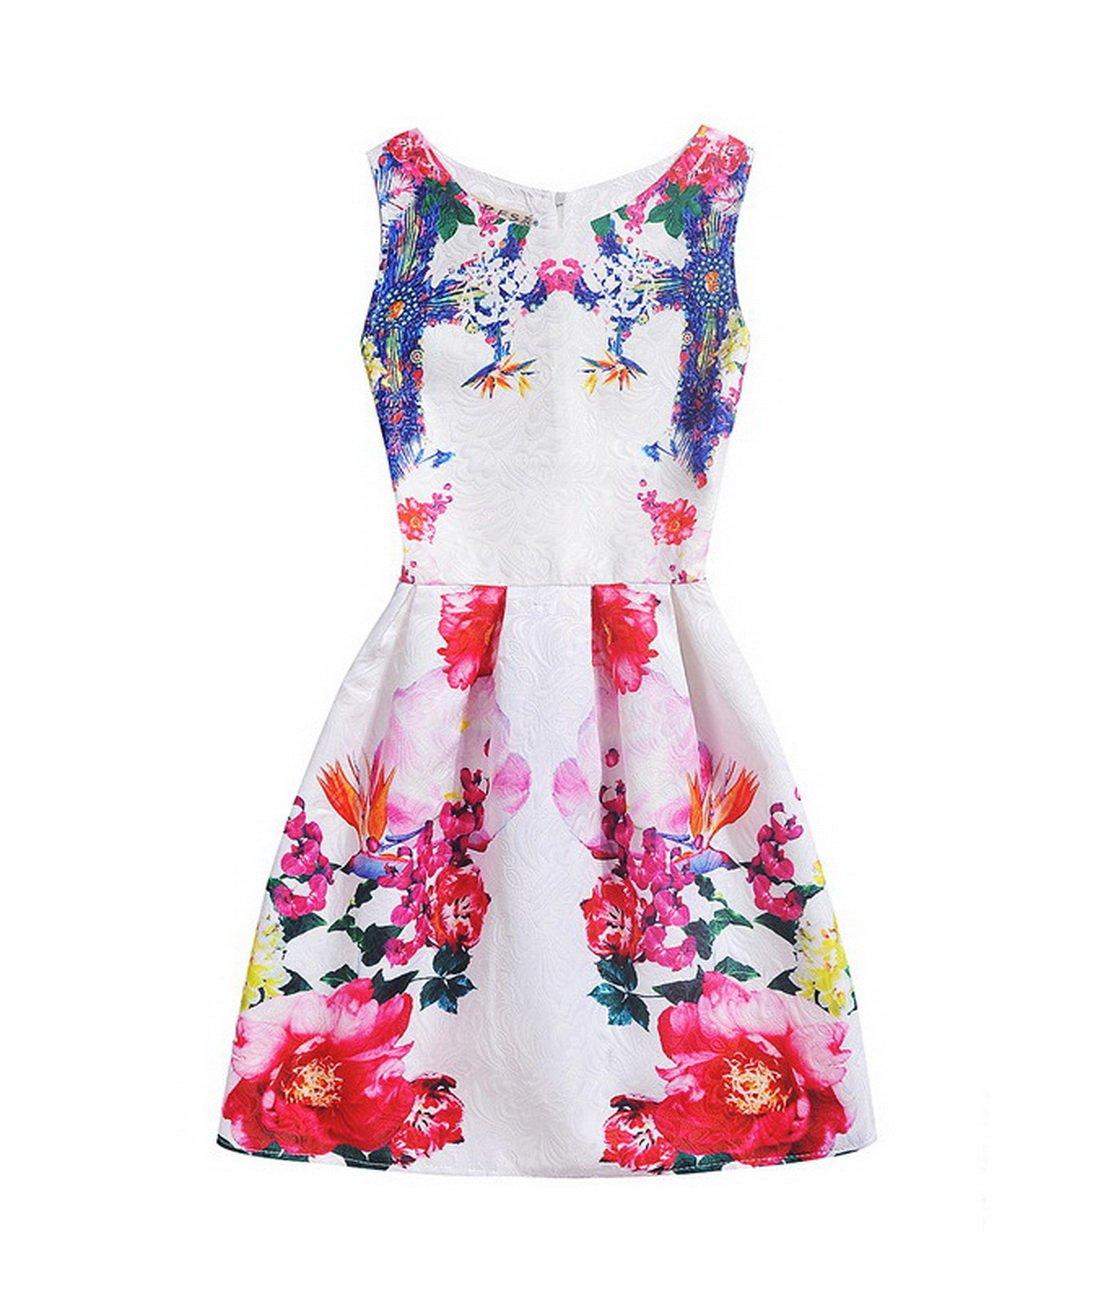 #B6026 Women's floral printing princess dresses